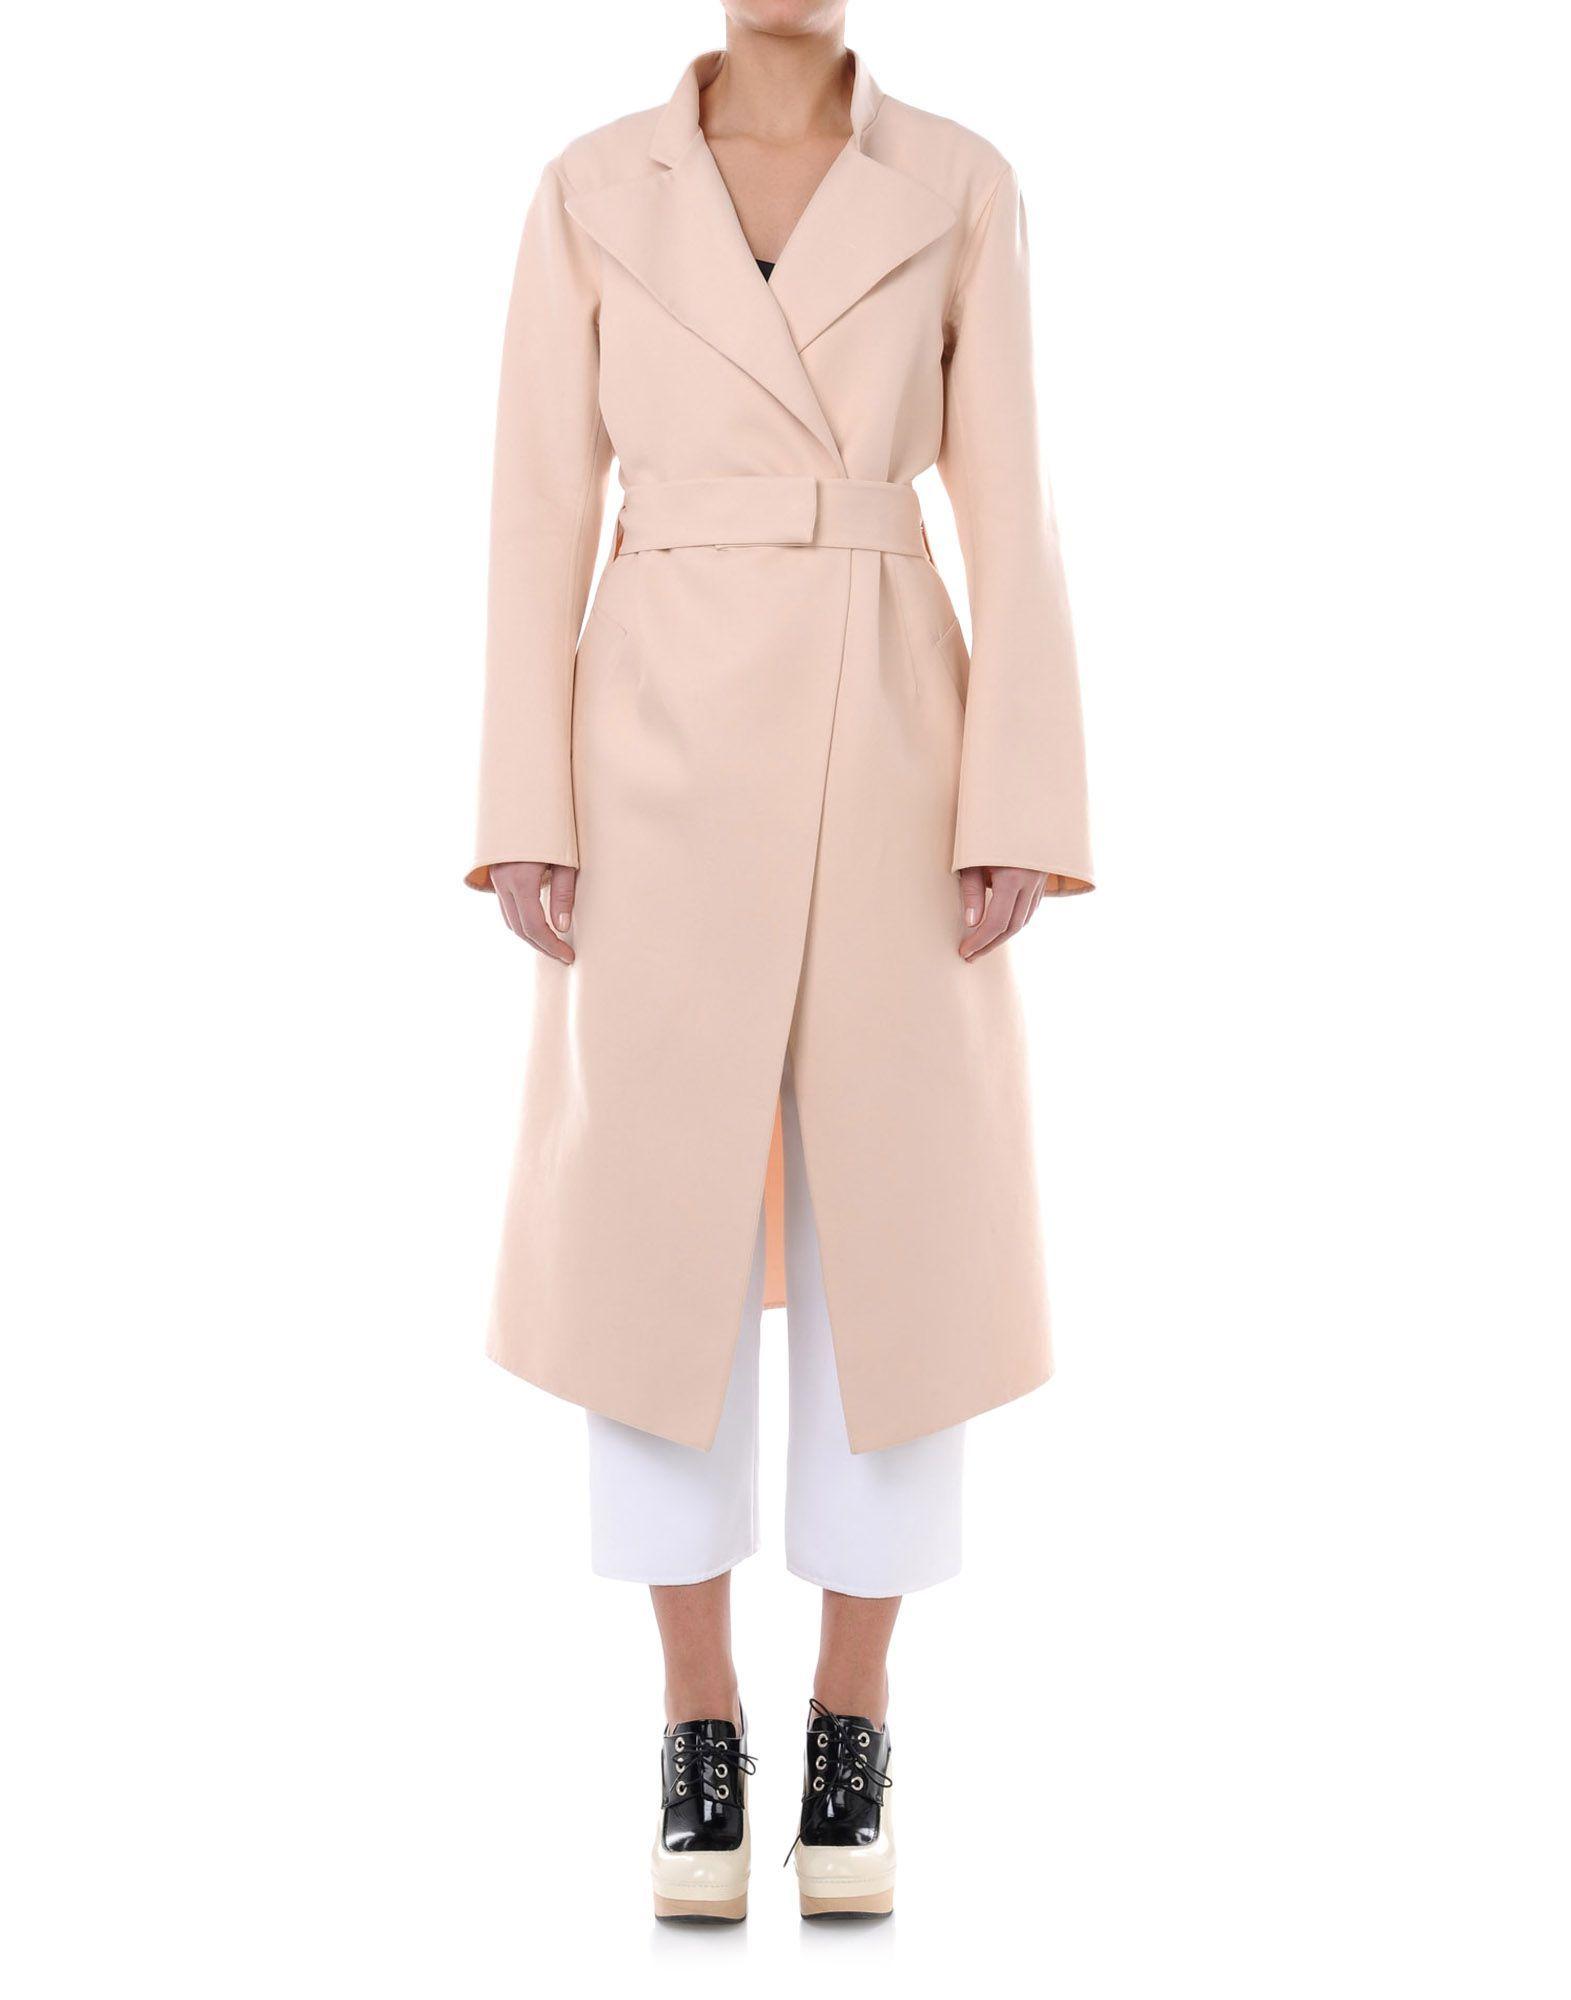 Coat - Coats & jackets Jil Sander Women on Jil Sander Online Store -  Autumn-Winter Collection for men and women.